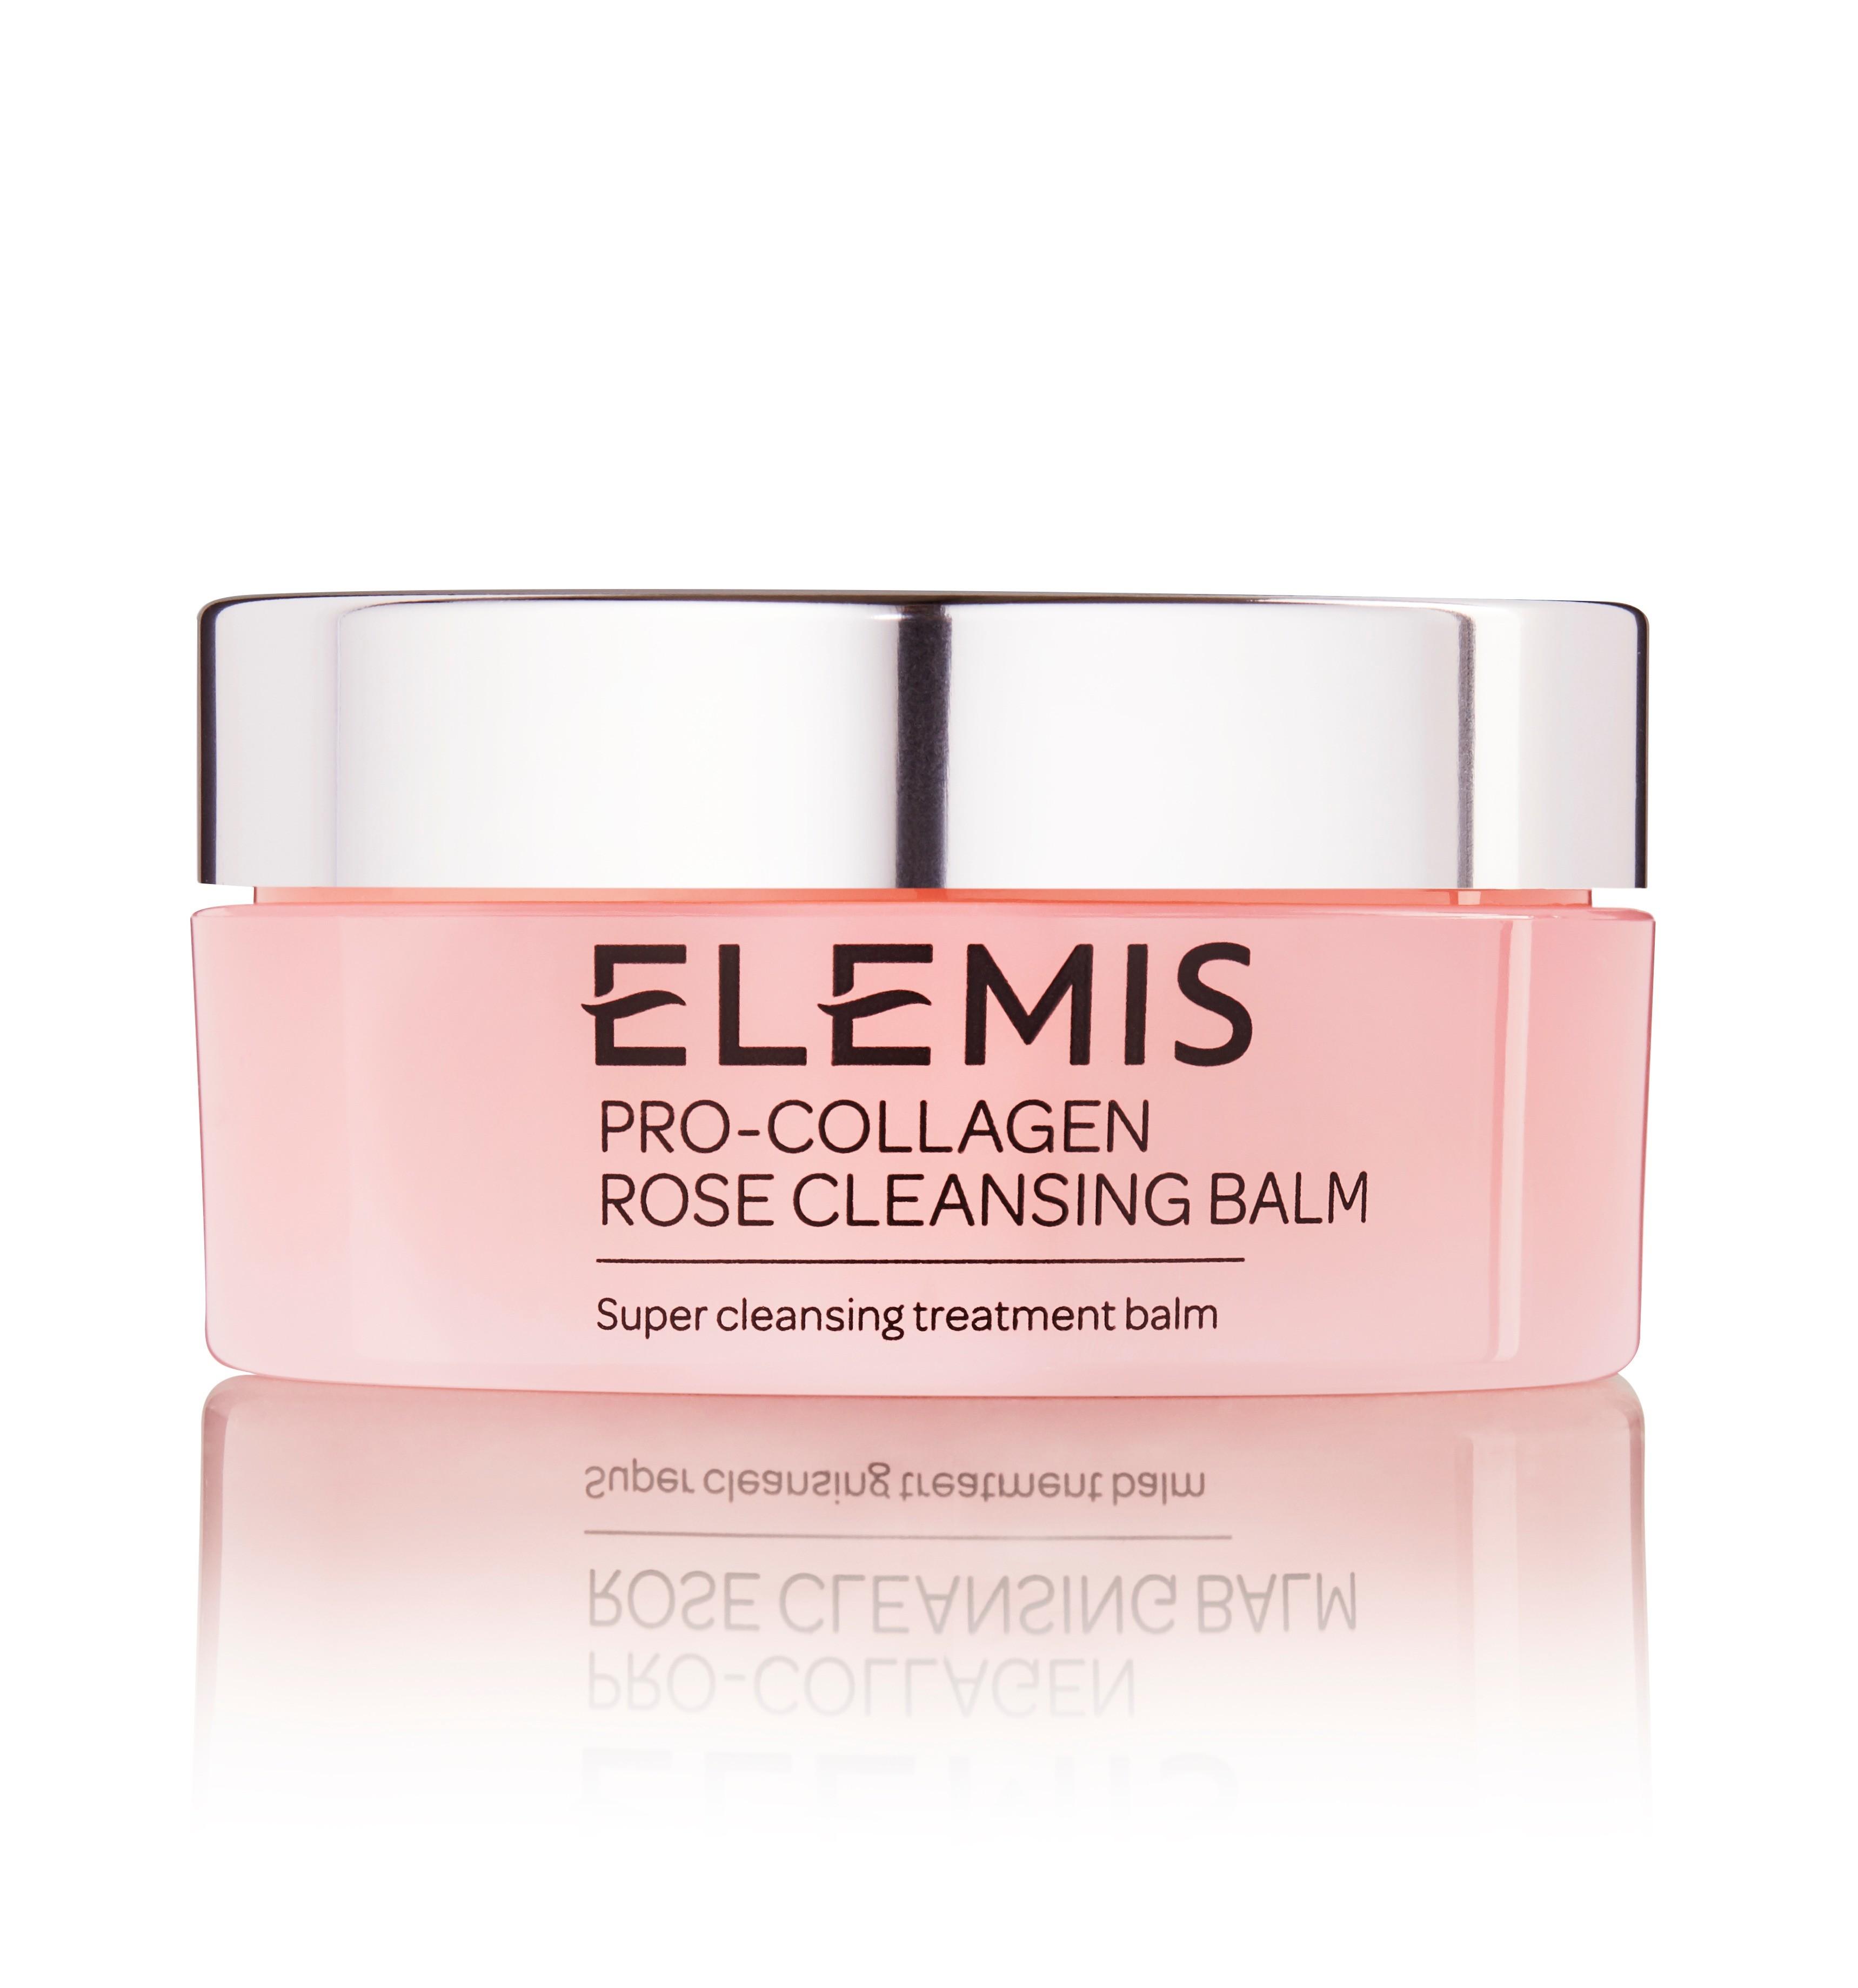 Бальзам для умывания Pro-Collagen Rose Cleansing Balm, Elemis